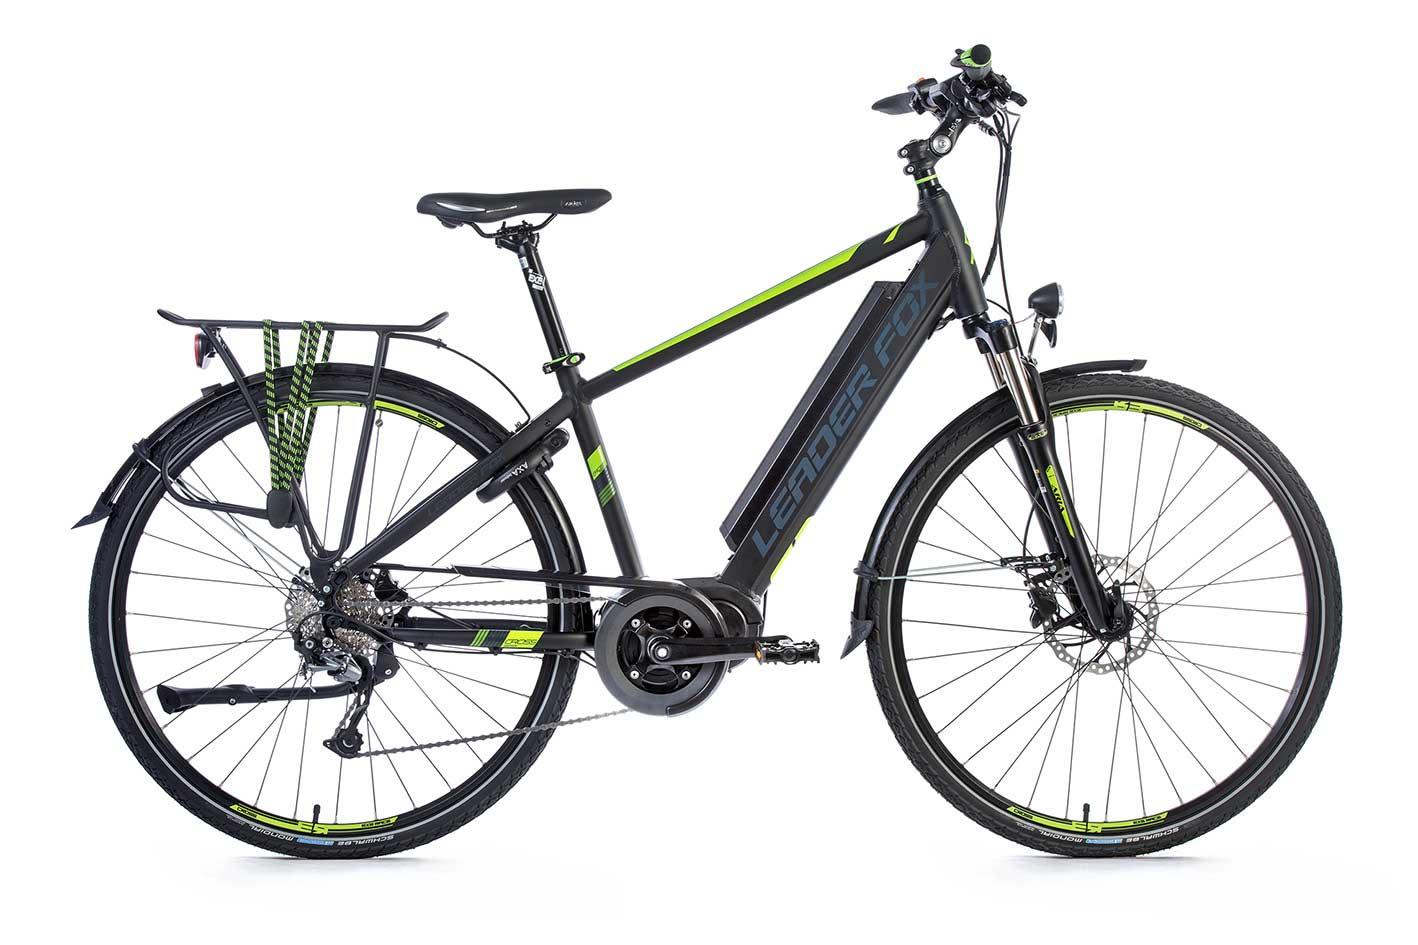 Bicicleta Electrica Leader Fox LUCAS Gent 2018